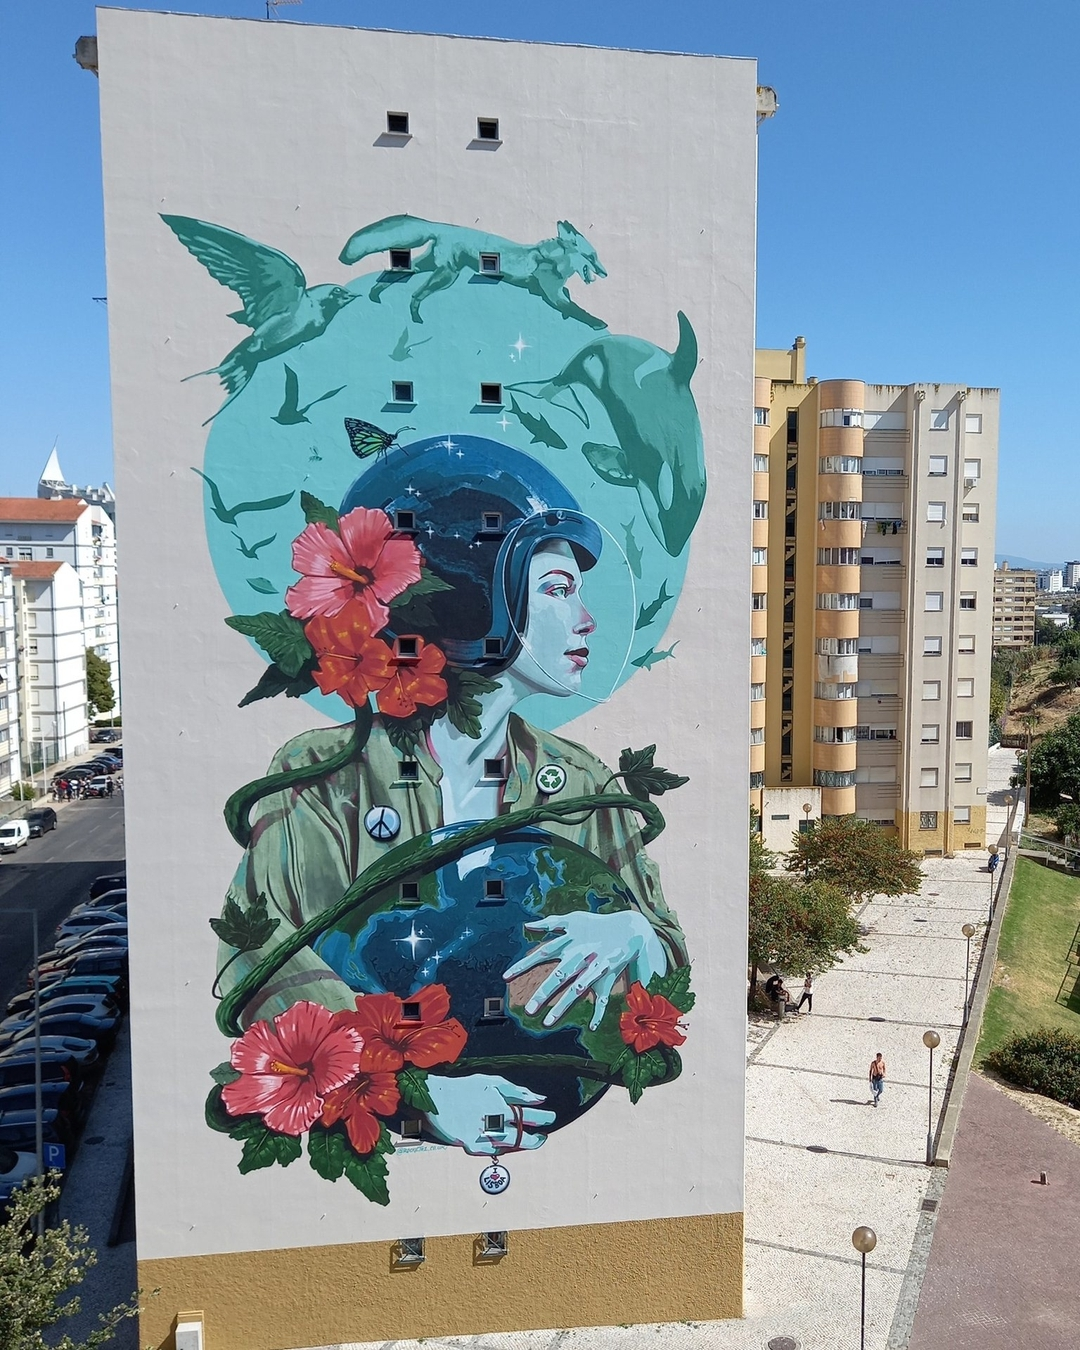 Rocket01 @ Lisbon, Portugal